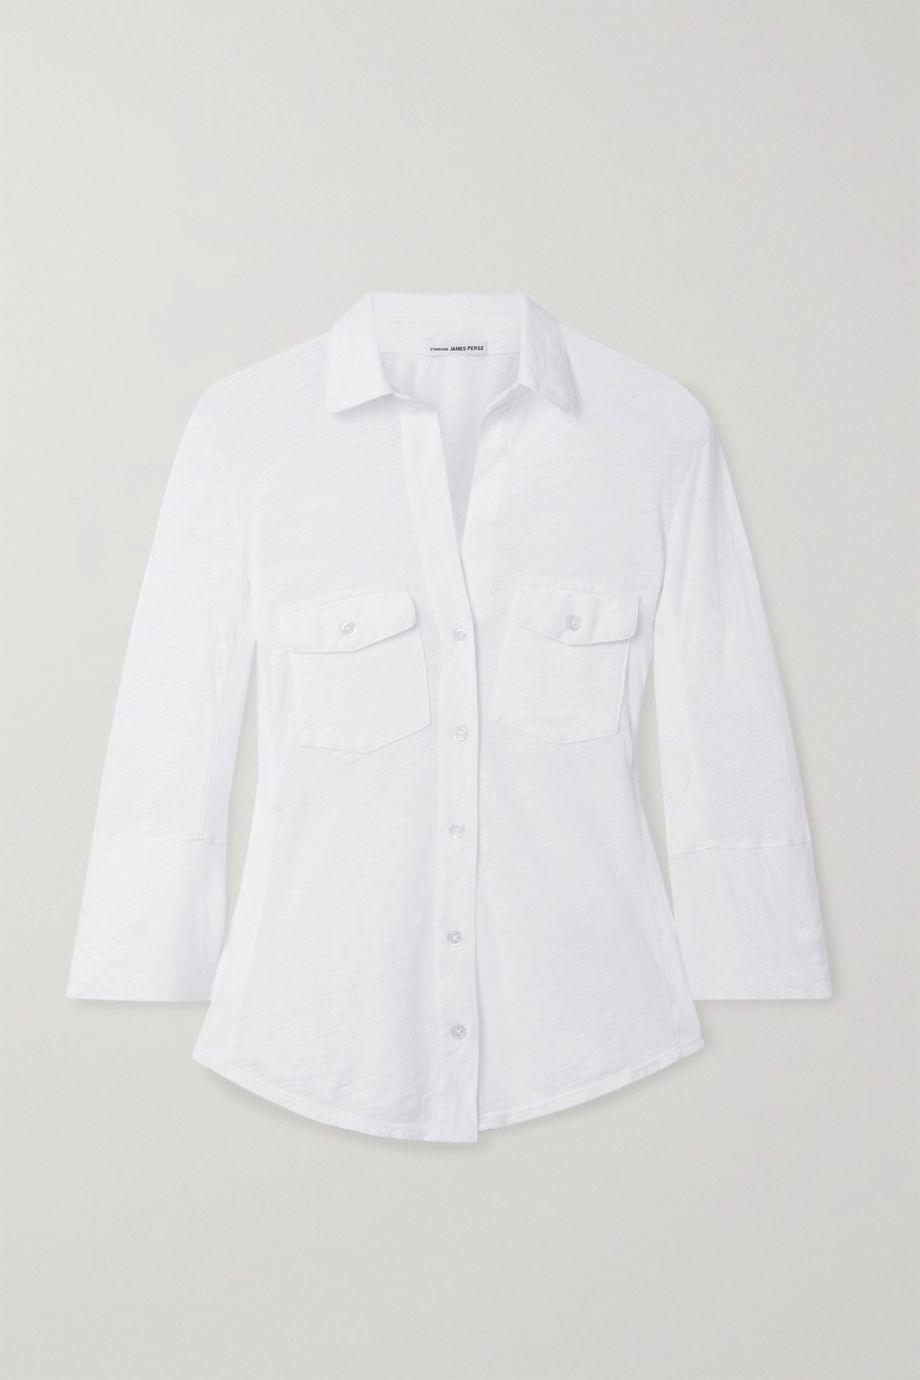 James Perse Slub cotton shirt